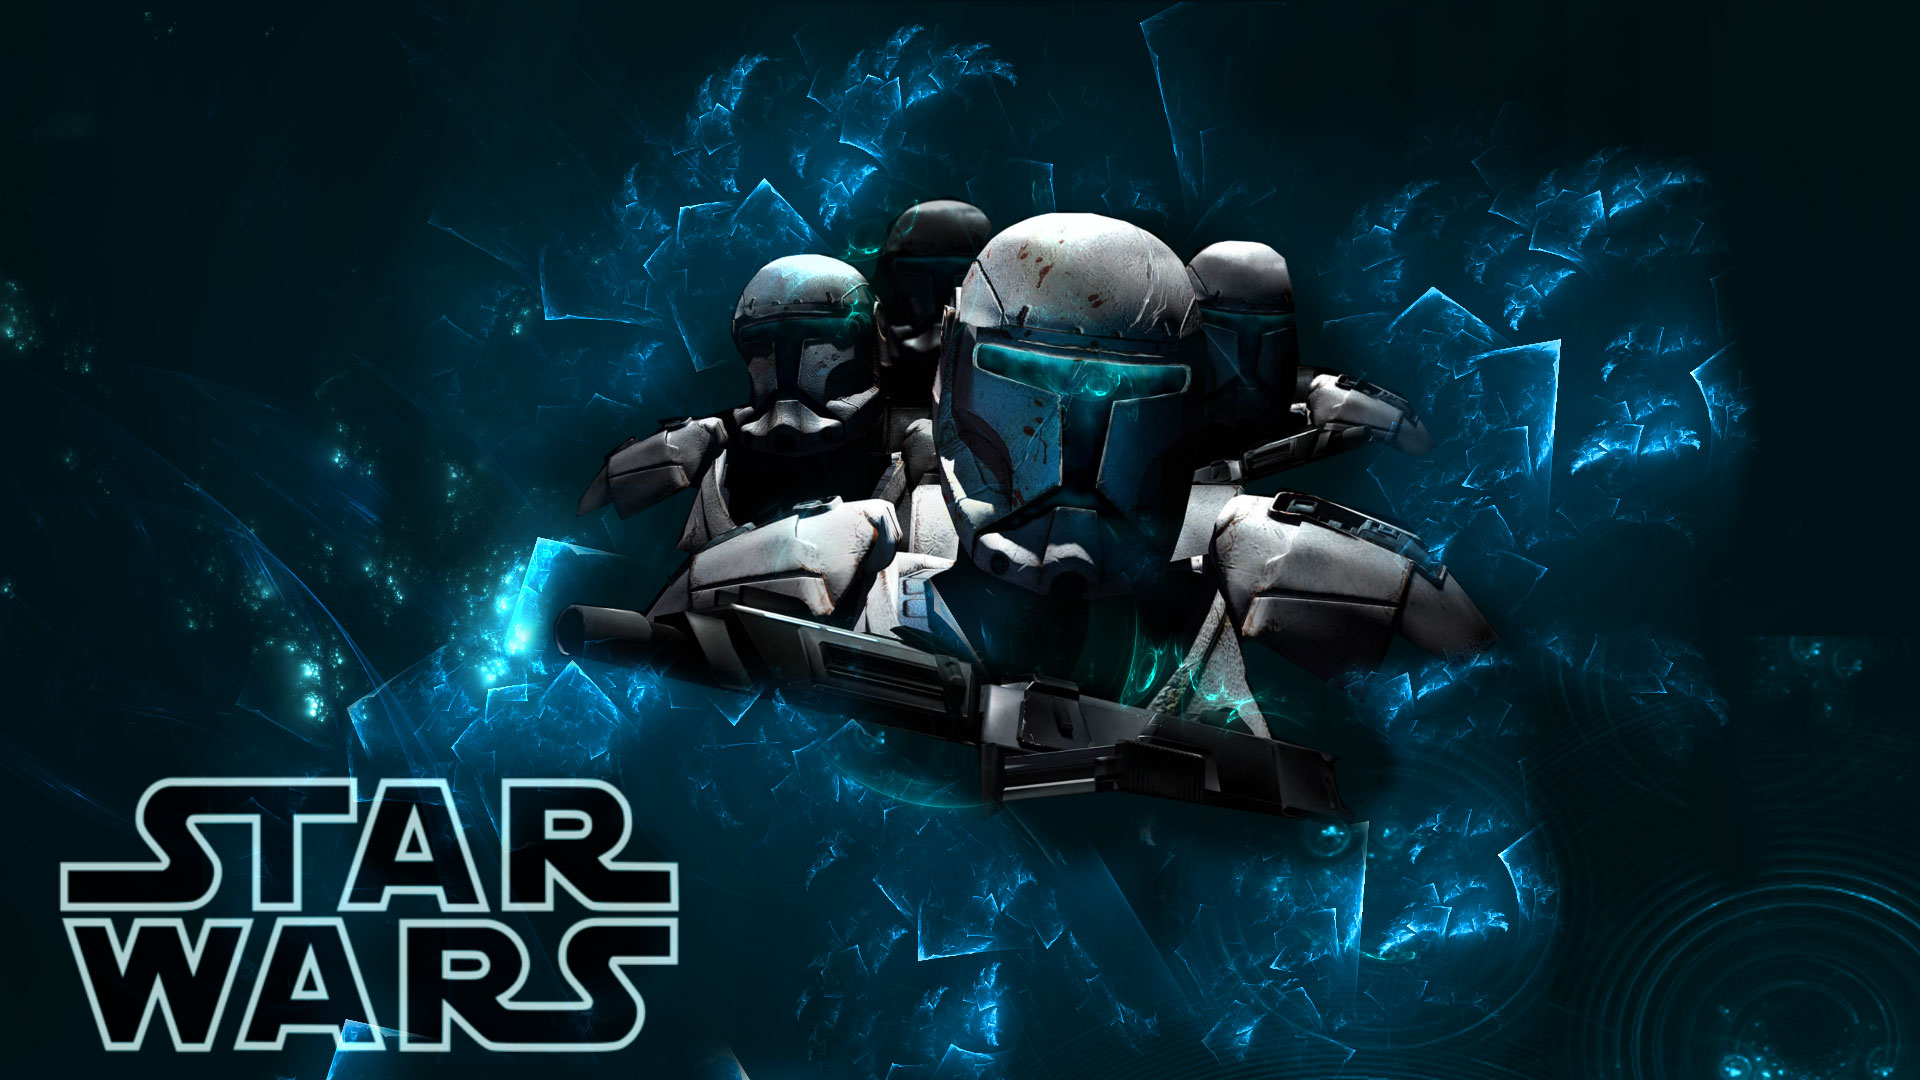 Star Wars wallpaper 4